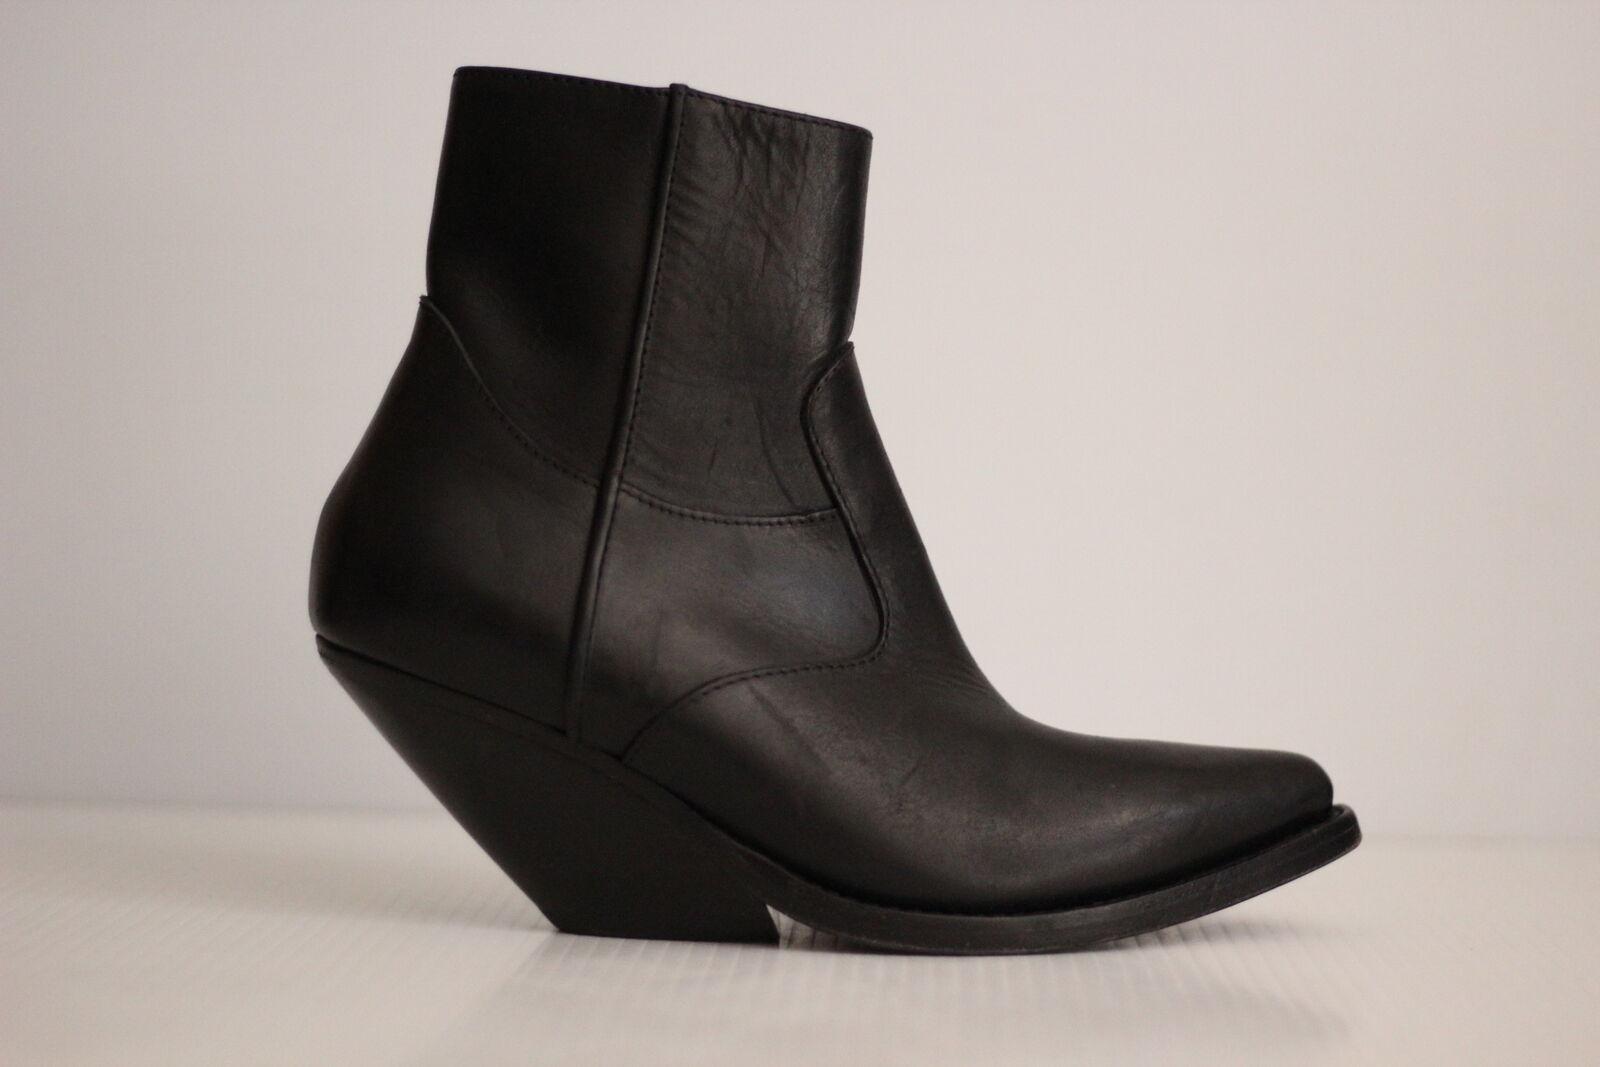 Vetements Demna Gvasalia Slanted Heel Black Leather Cowboy Ankle Ankle Ankle Boots- 7US   37 2d15d8